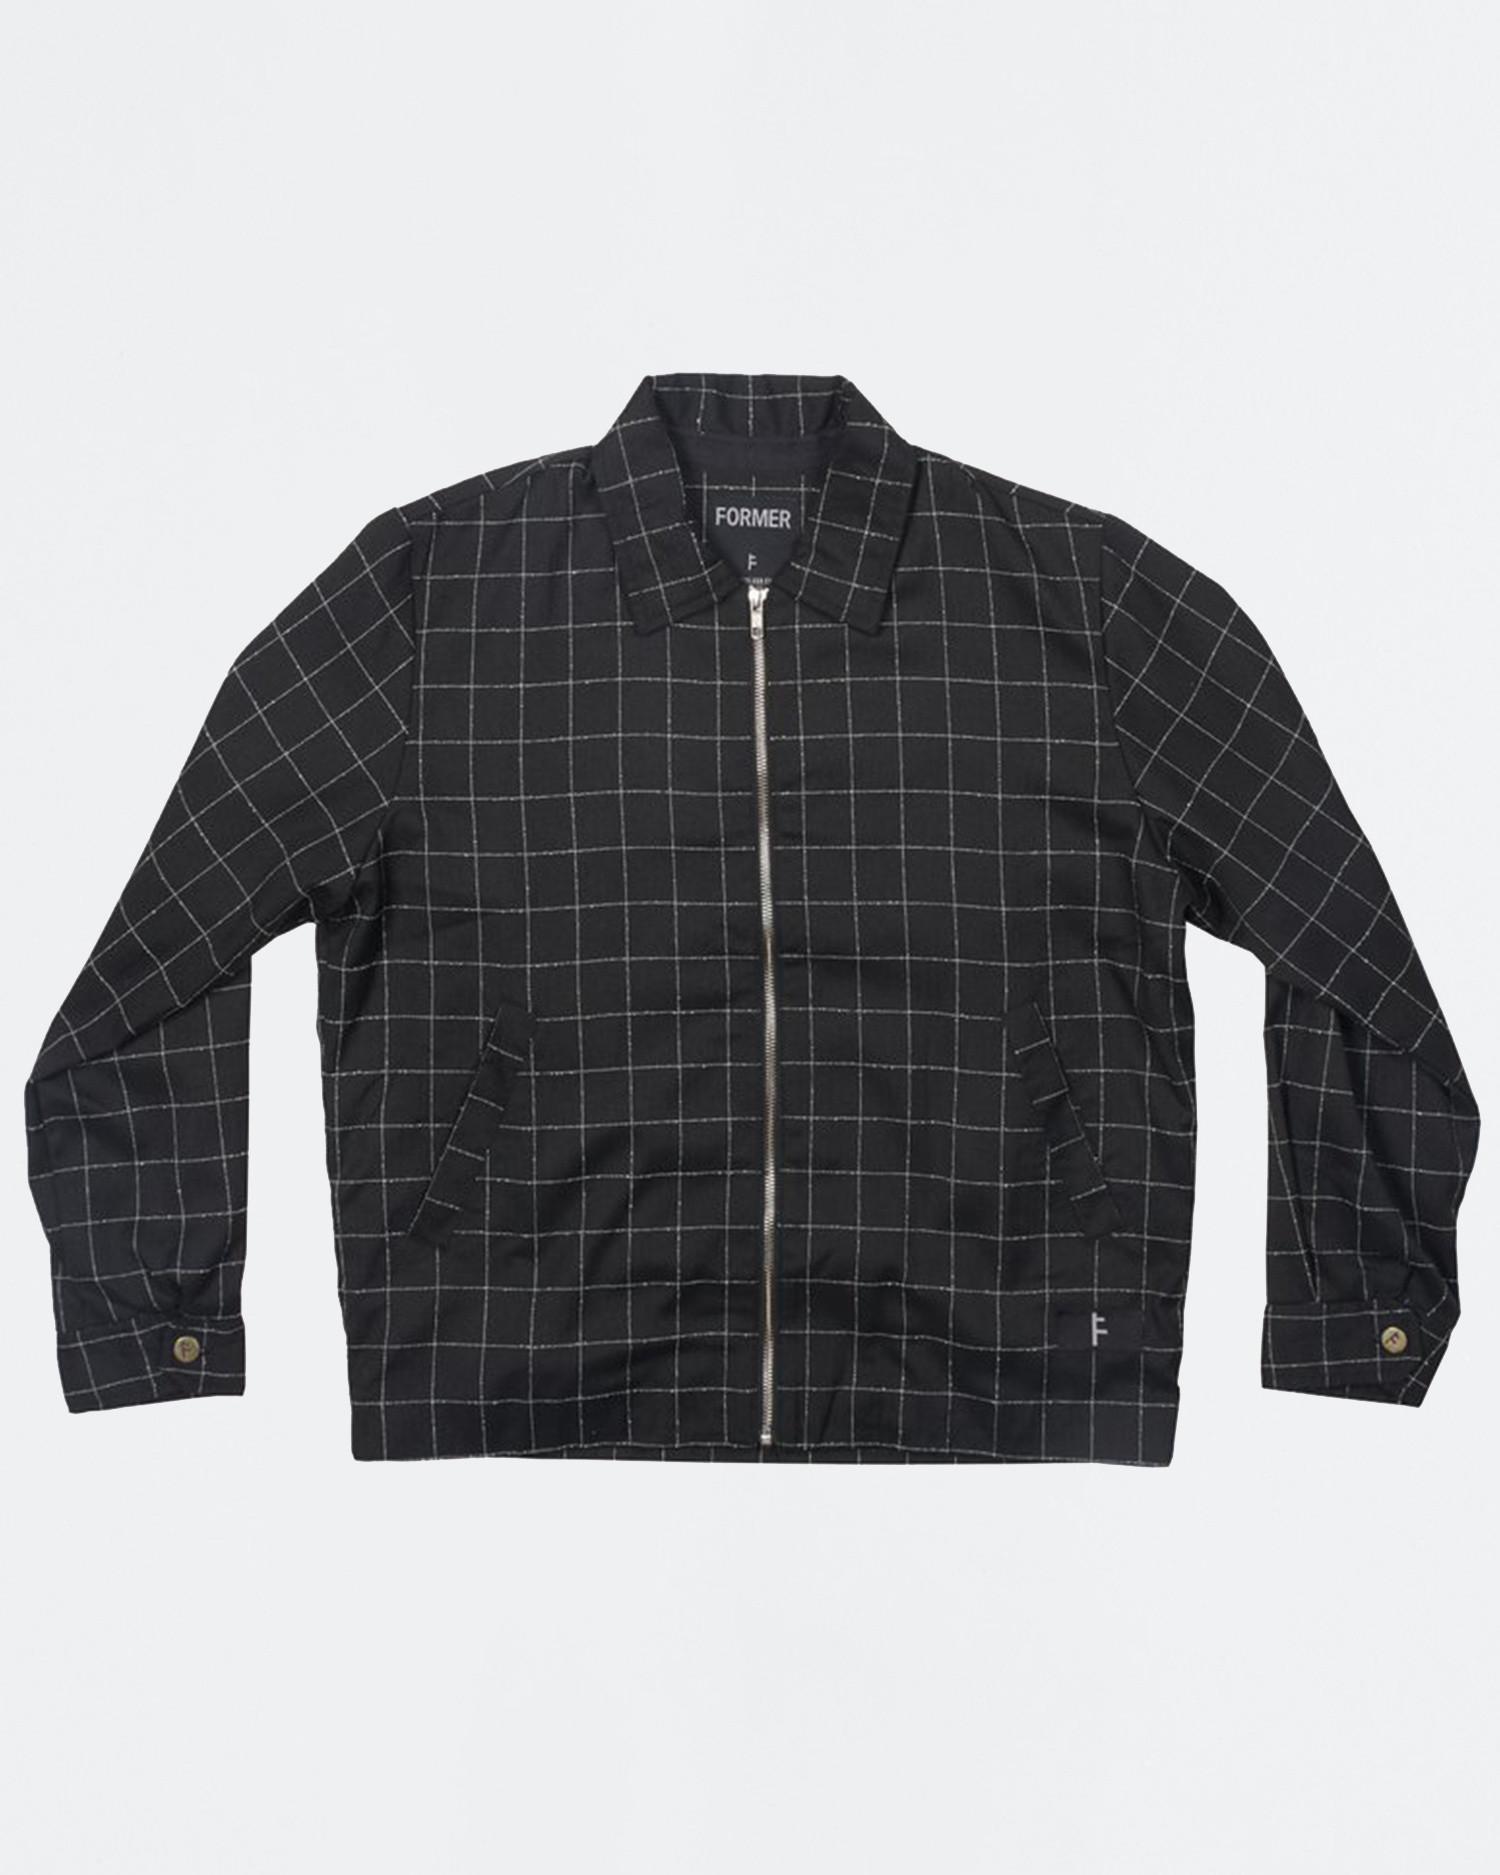 Former Cage Workwear Jacket Black Squared